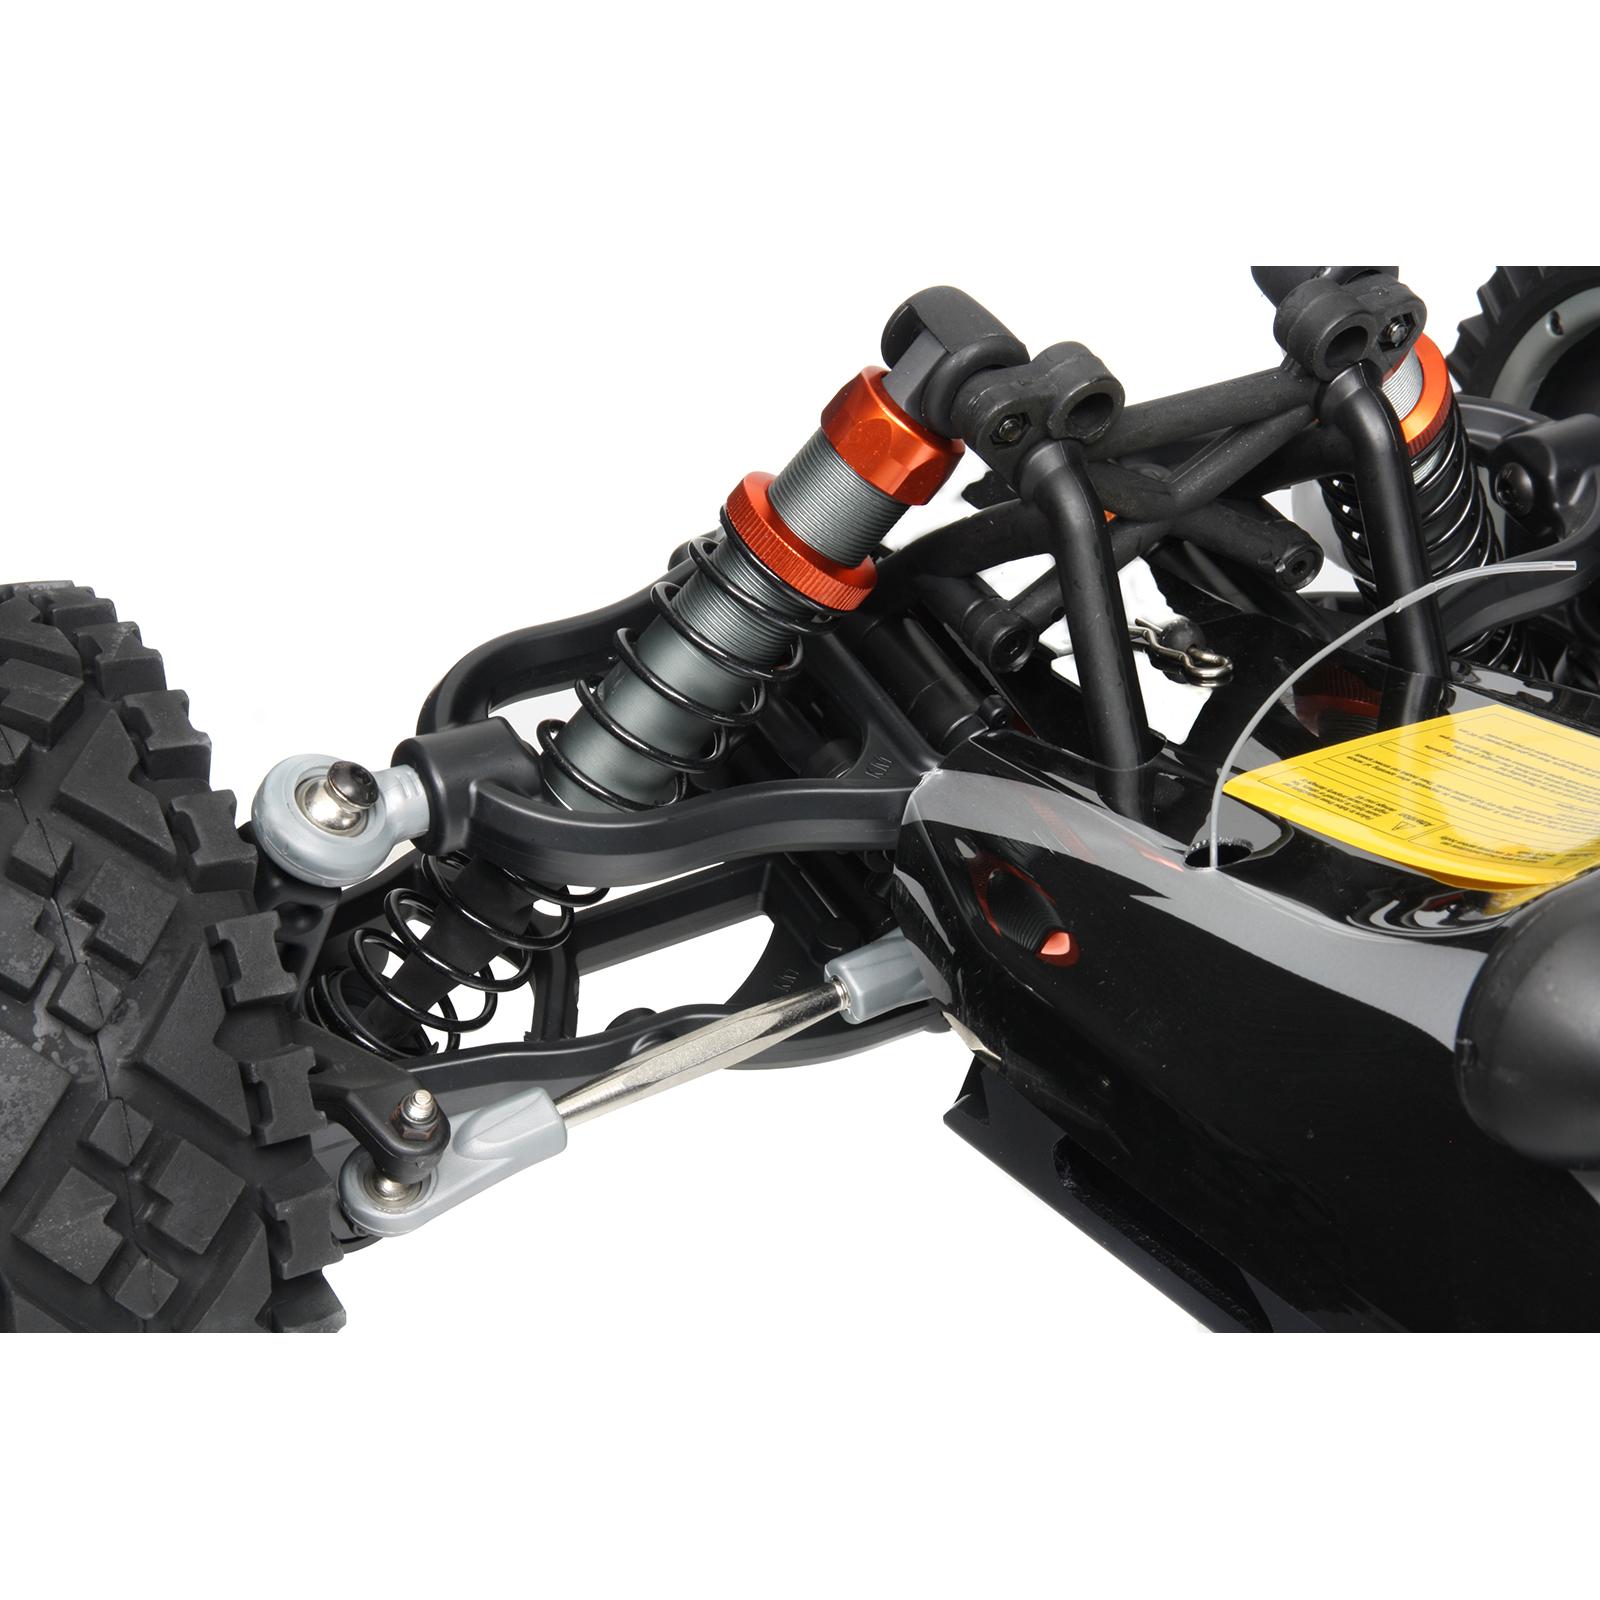 Sofa King Fast Racing: King Motor Baja KSRC001 Racing Grey RC Buggy At Hobby